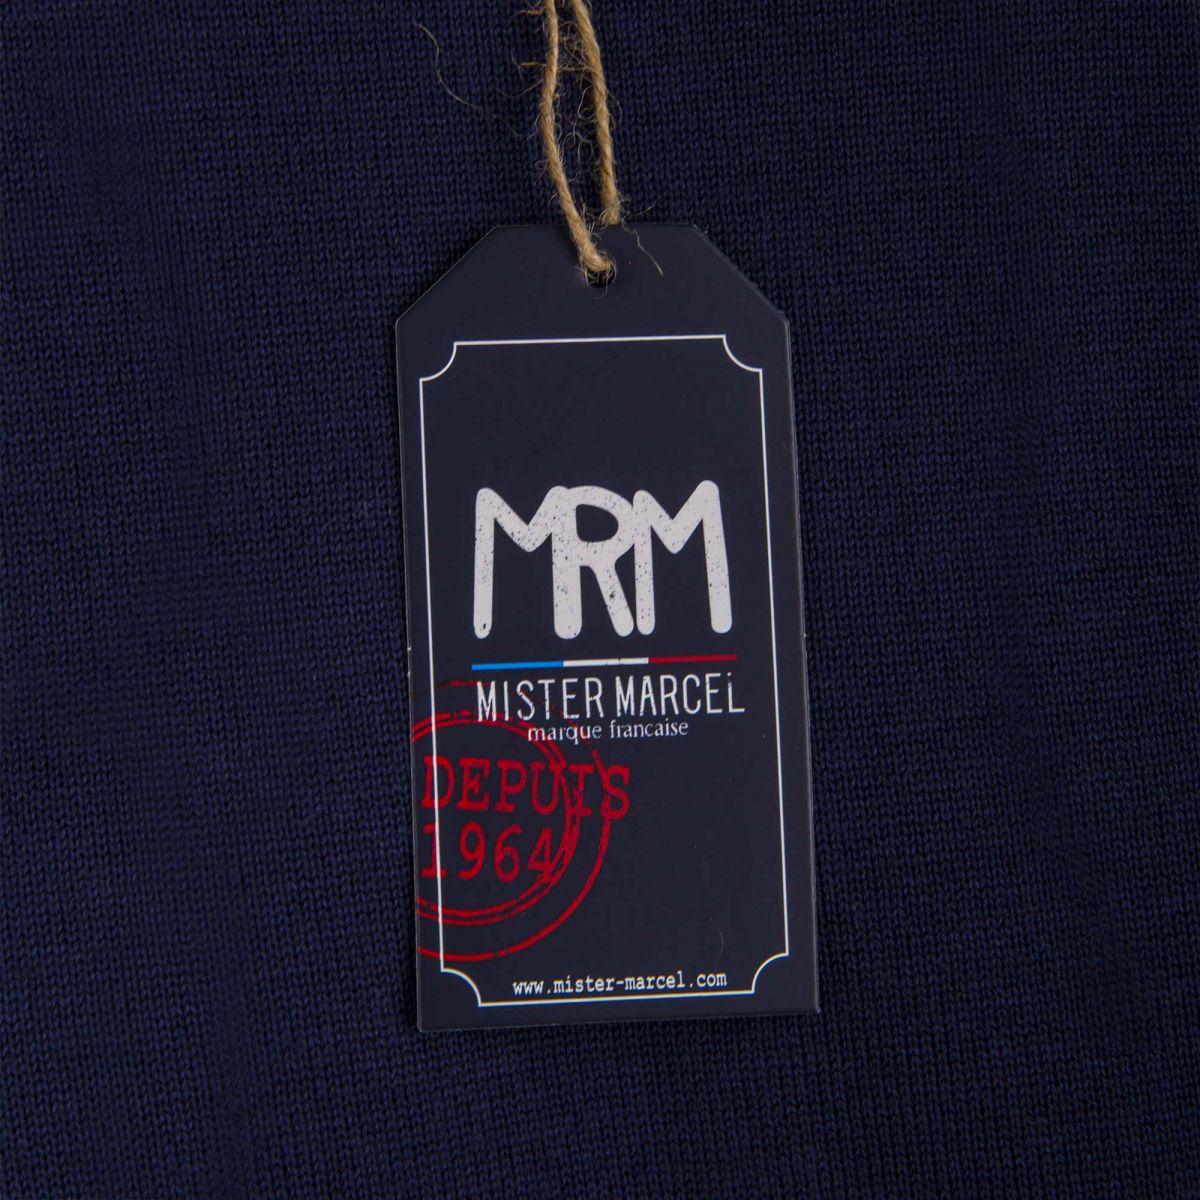 Pull bleu marine tokyo homme little marcel prix d griff for 70 portent un pull bleu